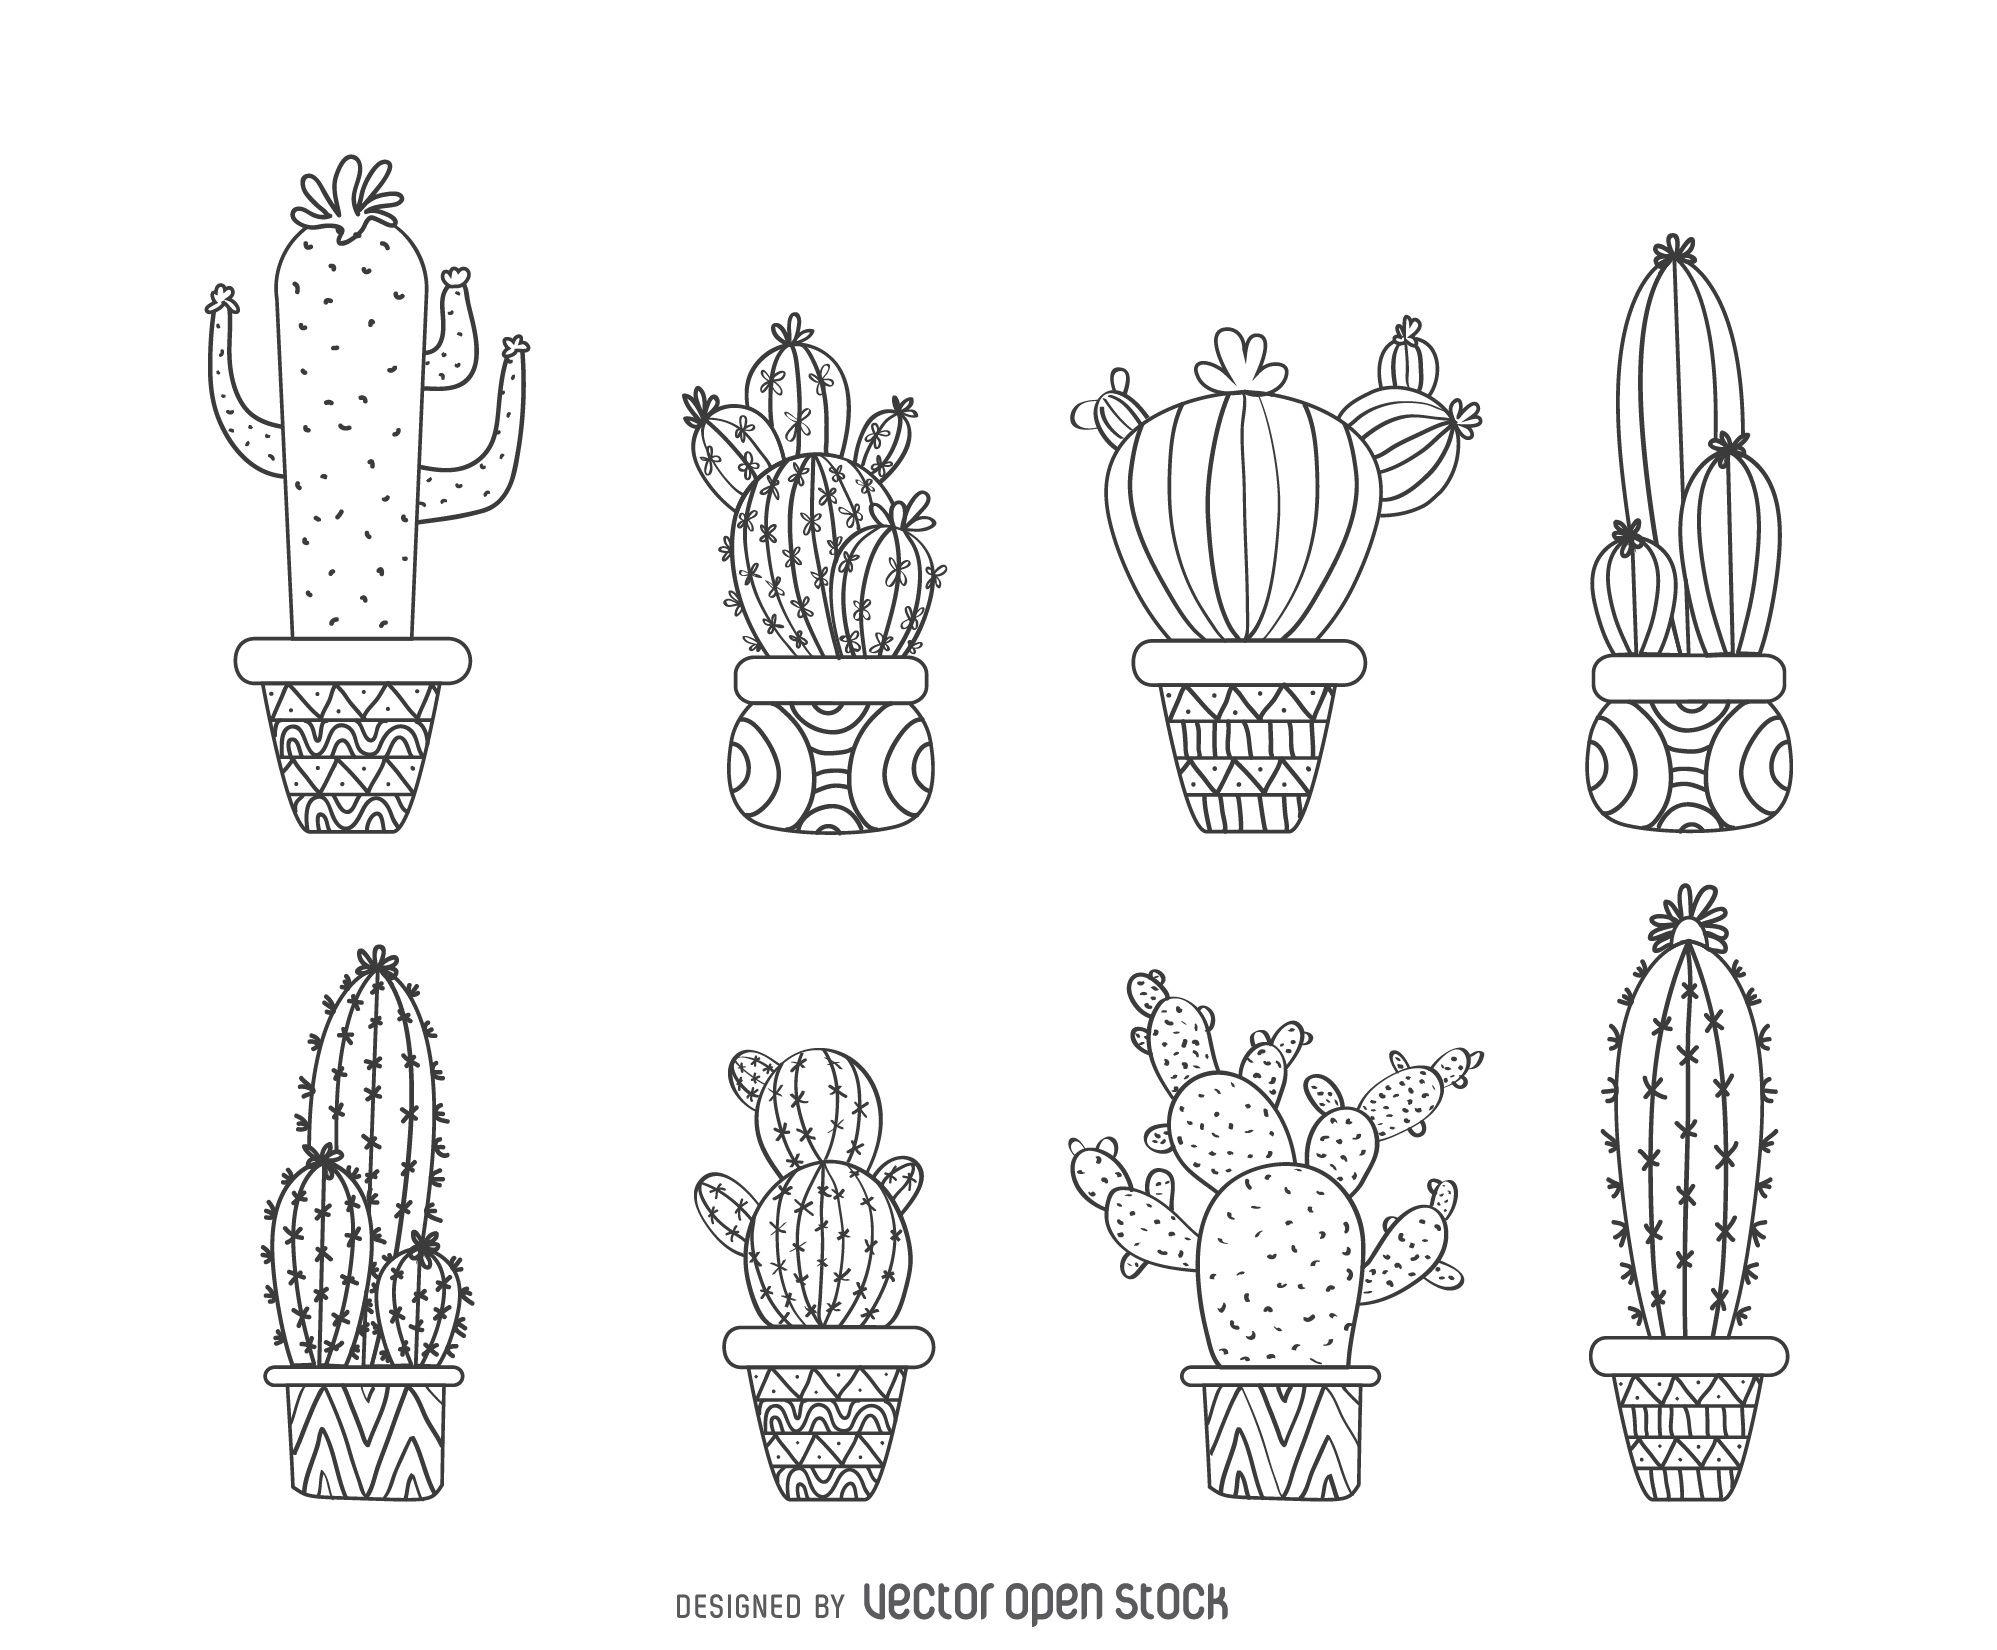 Cartoon Cute Cactuses Coloring Pages Tumblr Free 8 E Menggambar Tangan Kertas Dinding Buku Kliping